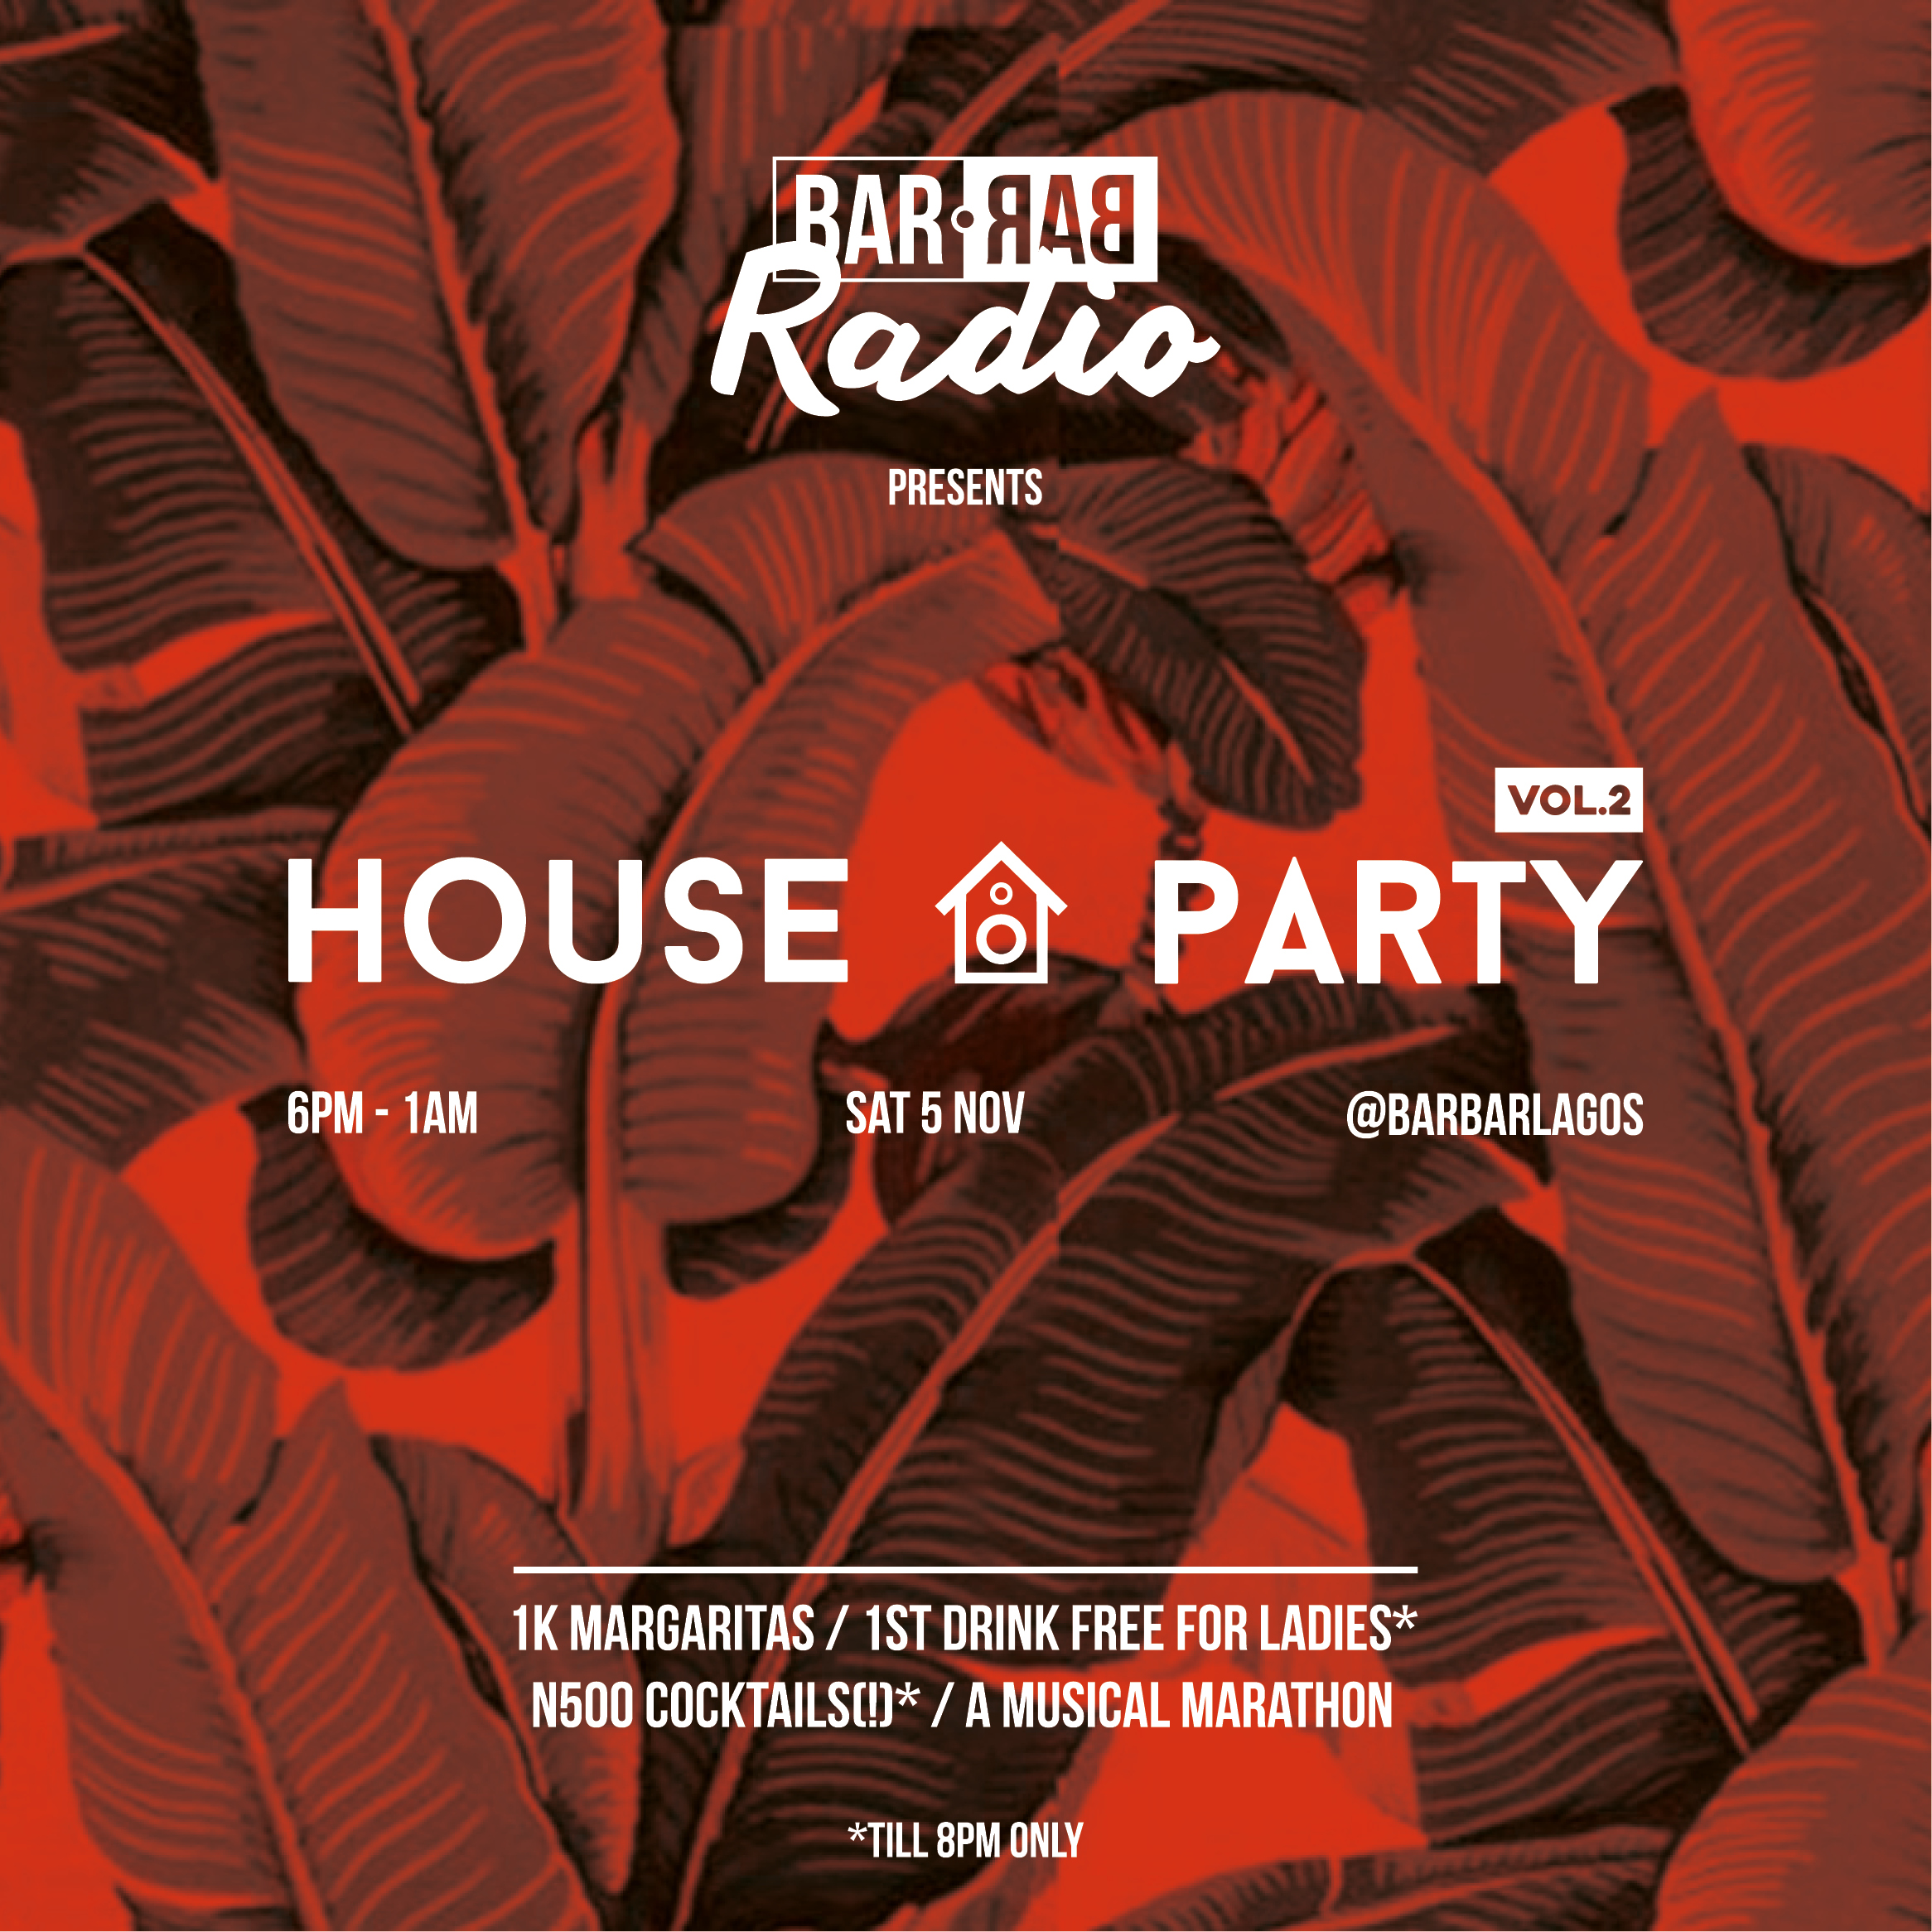 House Party Insta.jpg